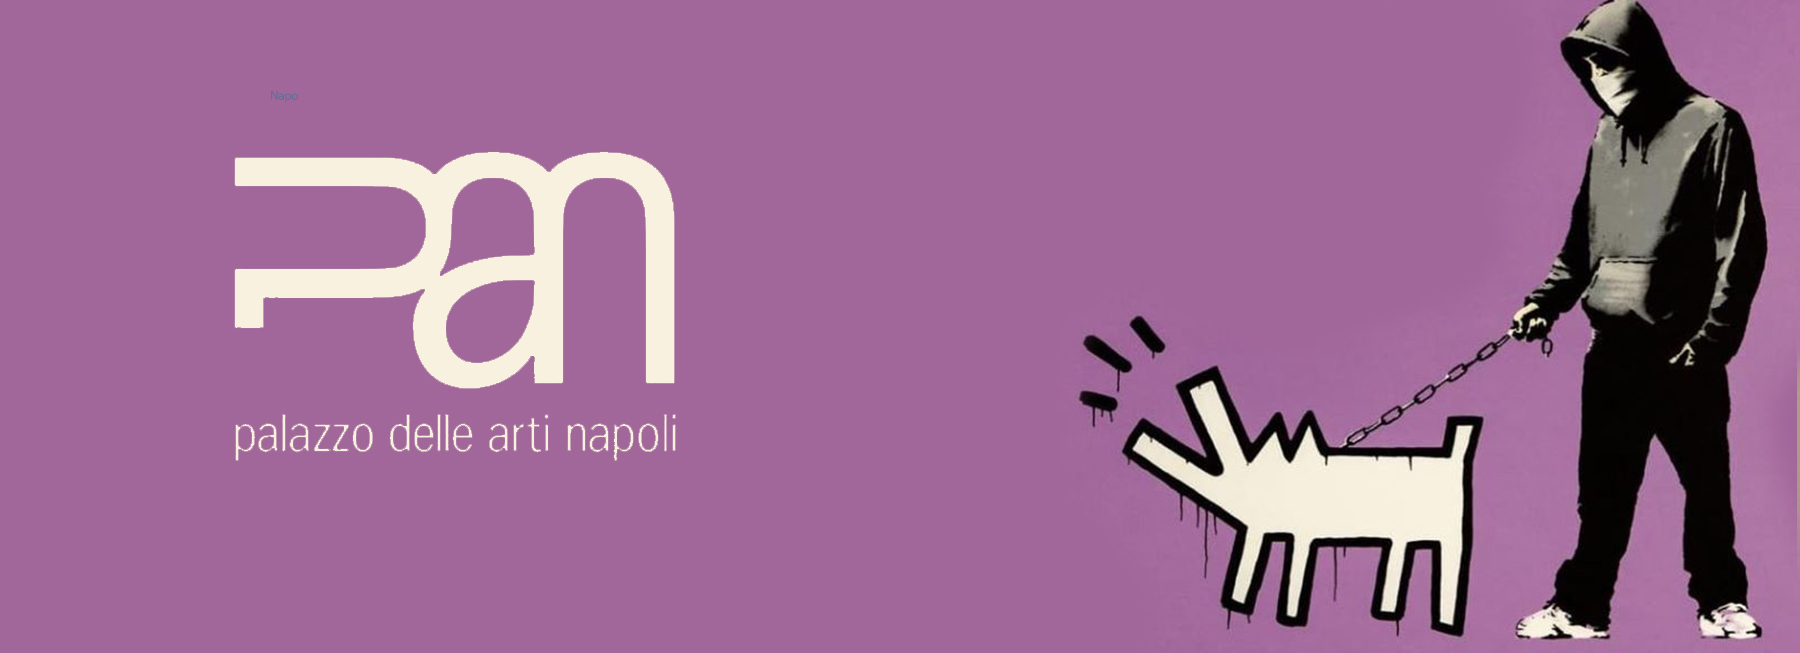 Naples Museum Celebrates Street Art